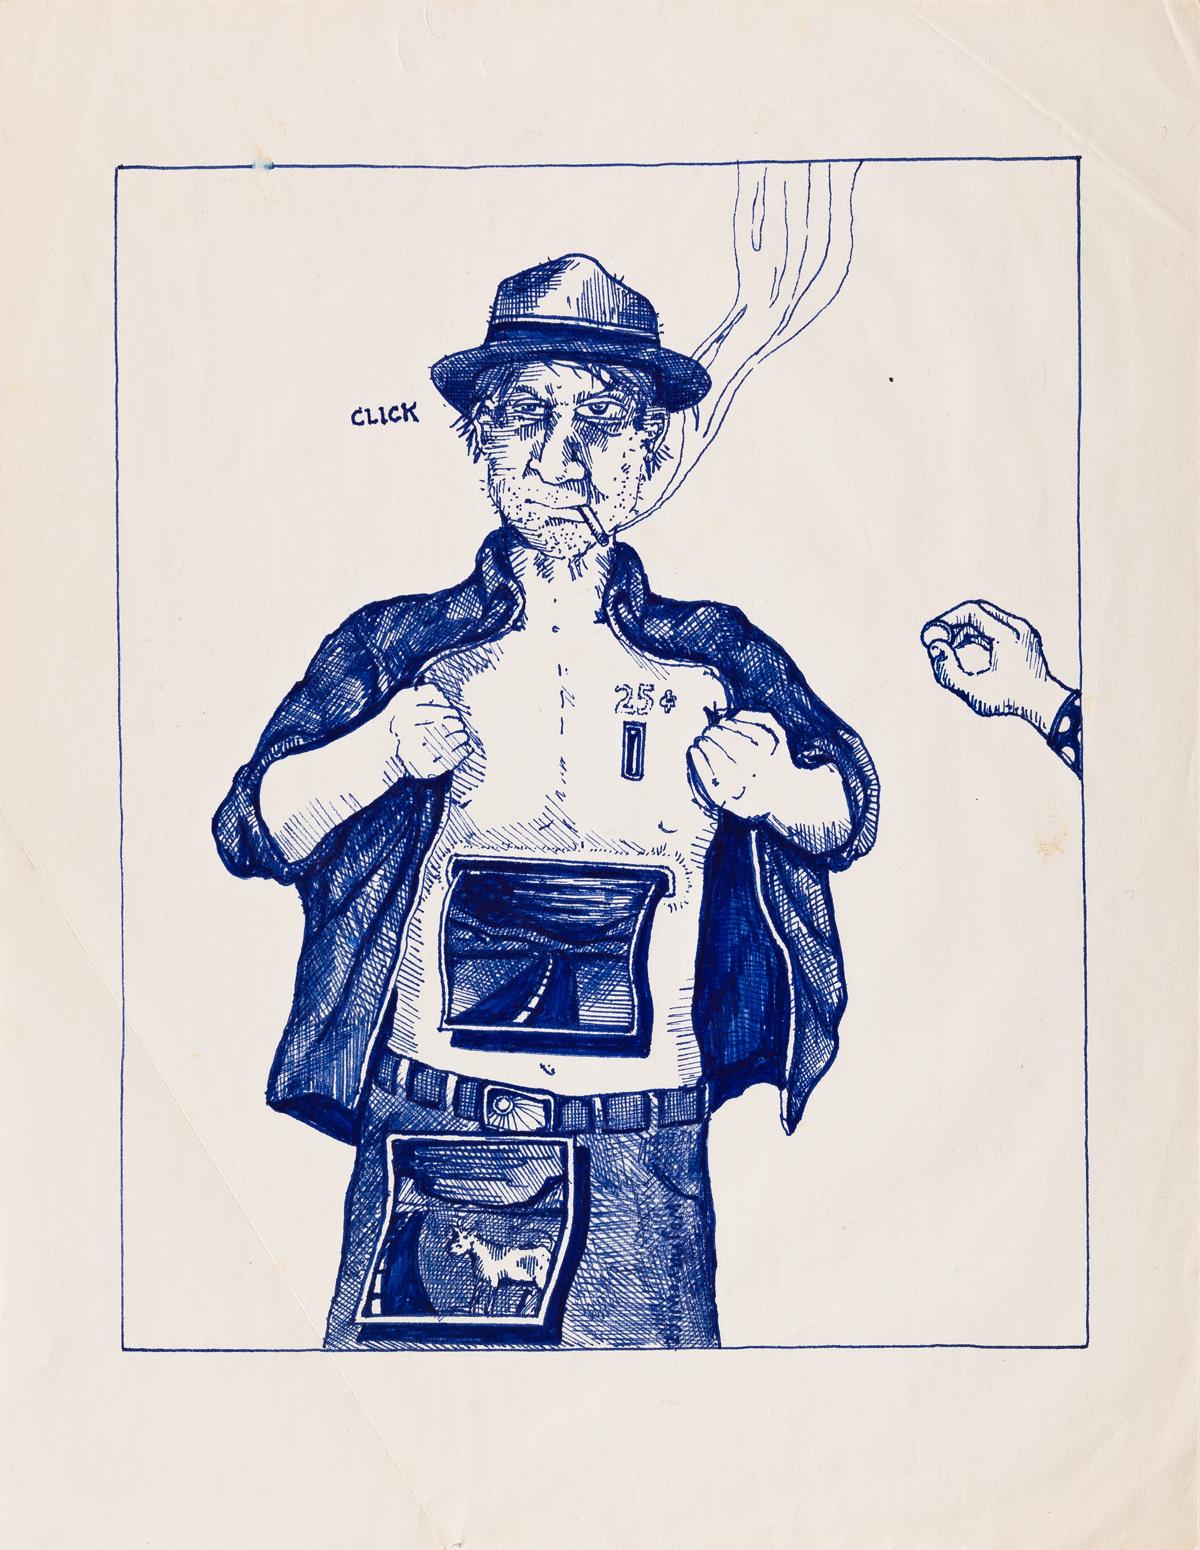 DAVID-WOJNAROWICZ-(1954-1992)-Two-drawings